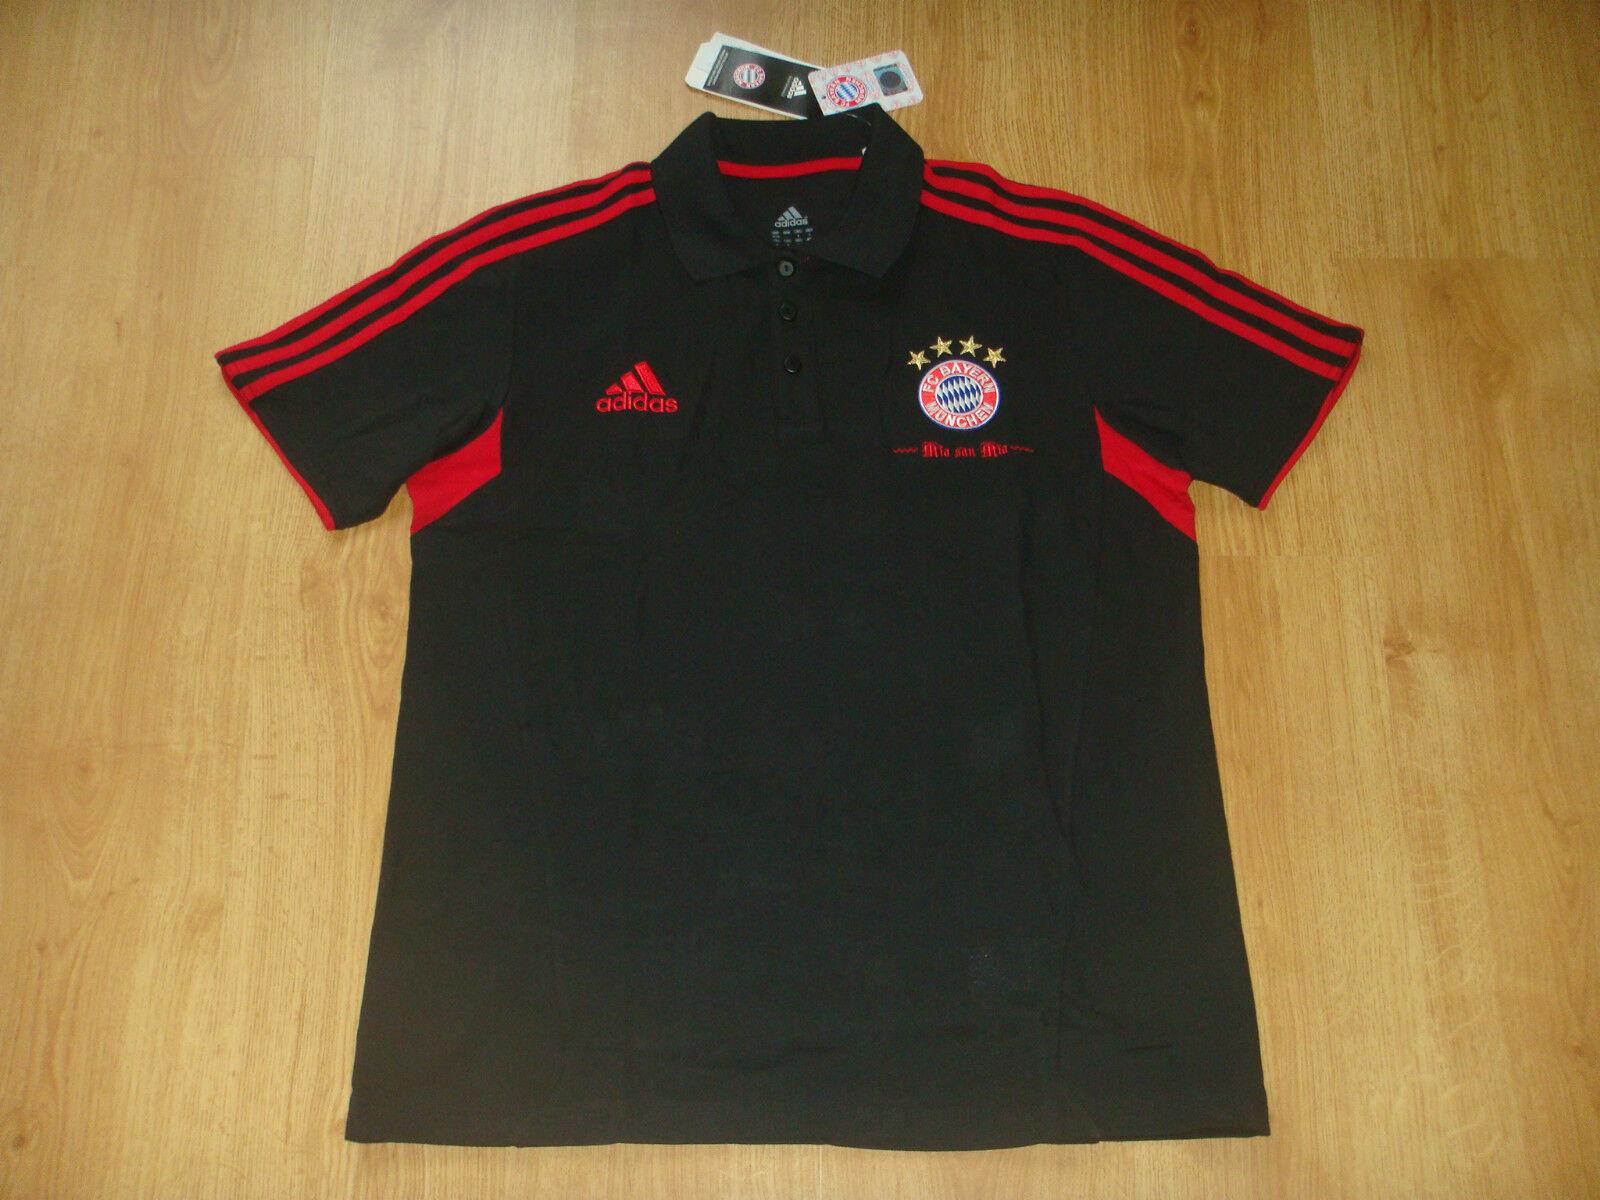 Bayern Munchen Soccer Training Top Adidas Germany Munich Football Polo Shirt NEW